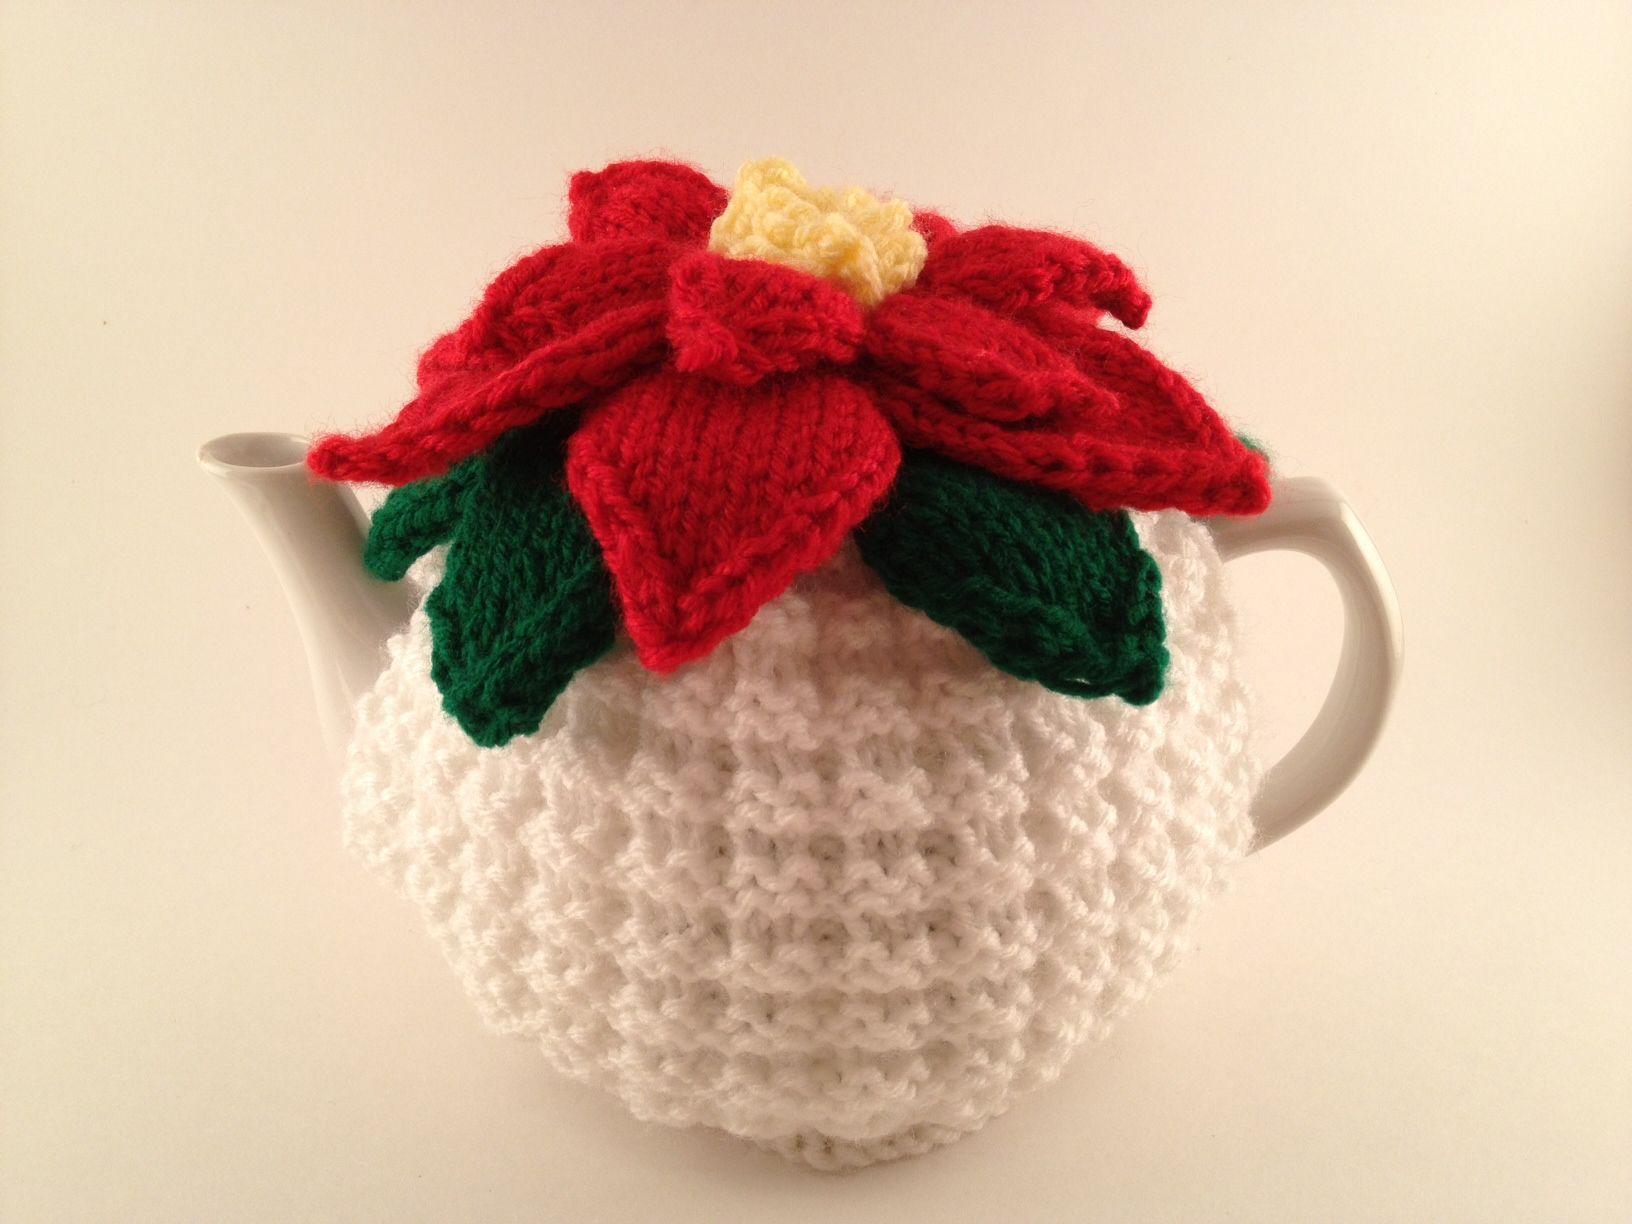 Poinsettia knit tea cosy tea cozy for your teapot handmade by poinsettia knit tea cosy tea cozy for your teapot handmade by nana bankloansurffo Choice Image